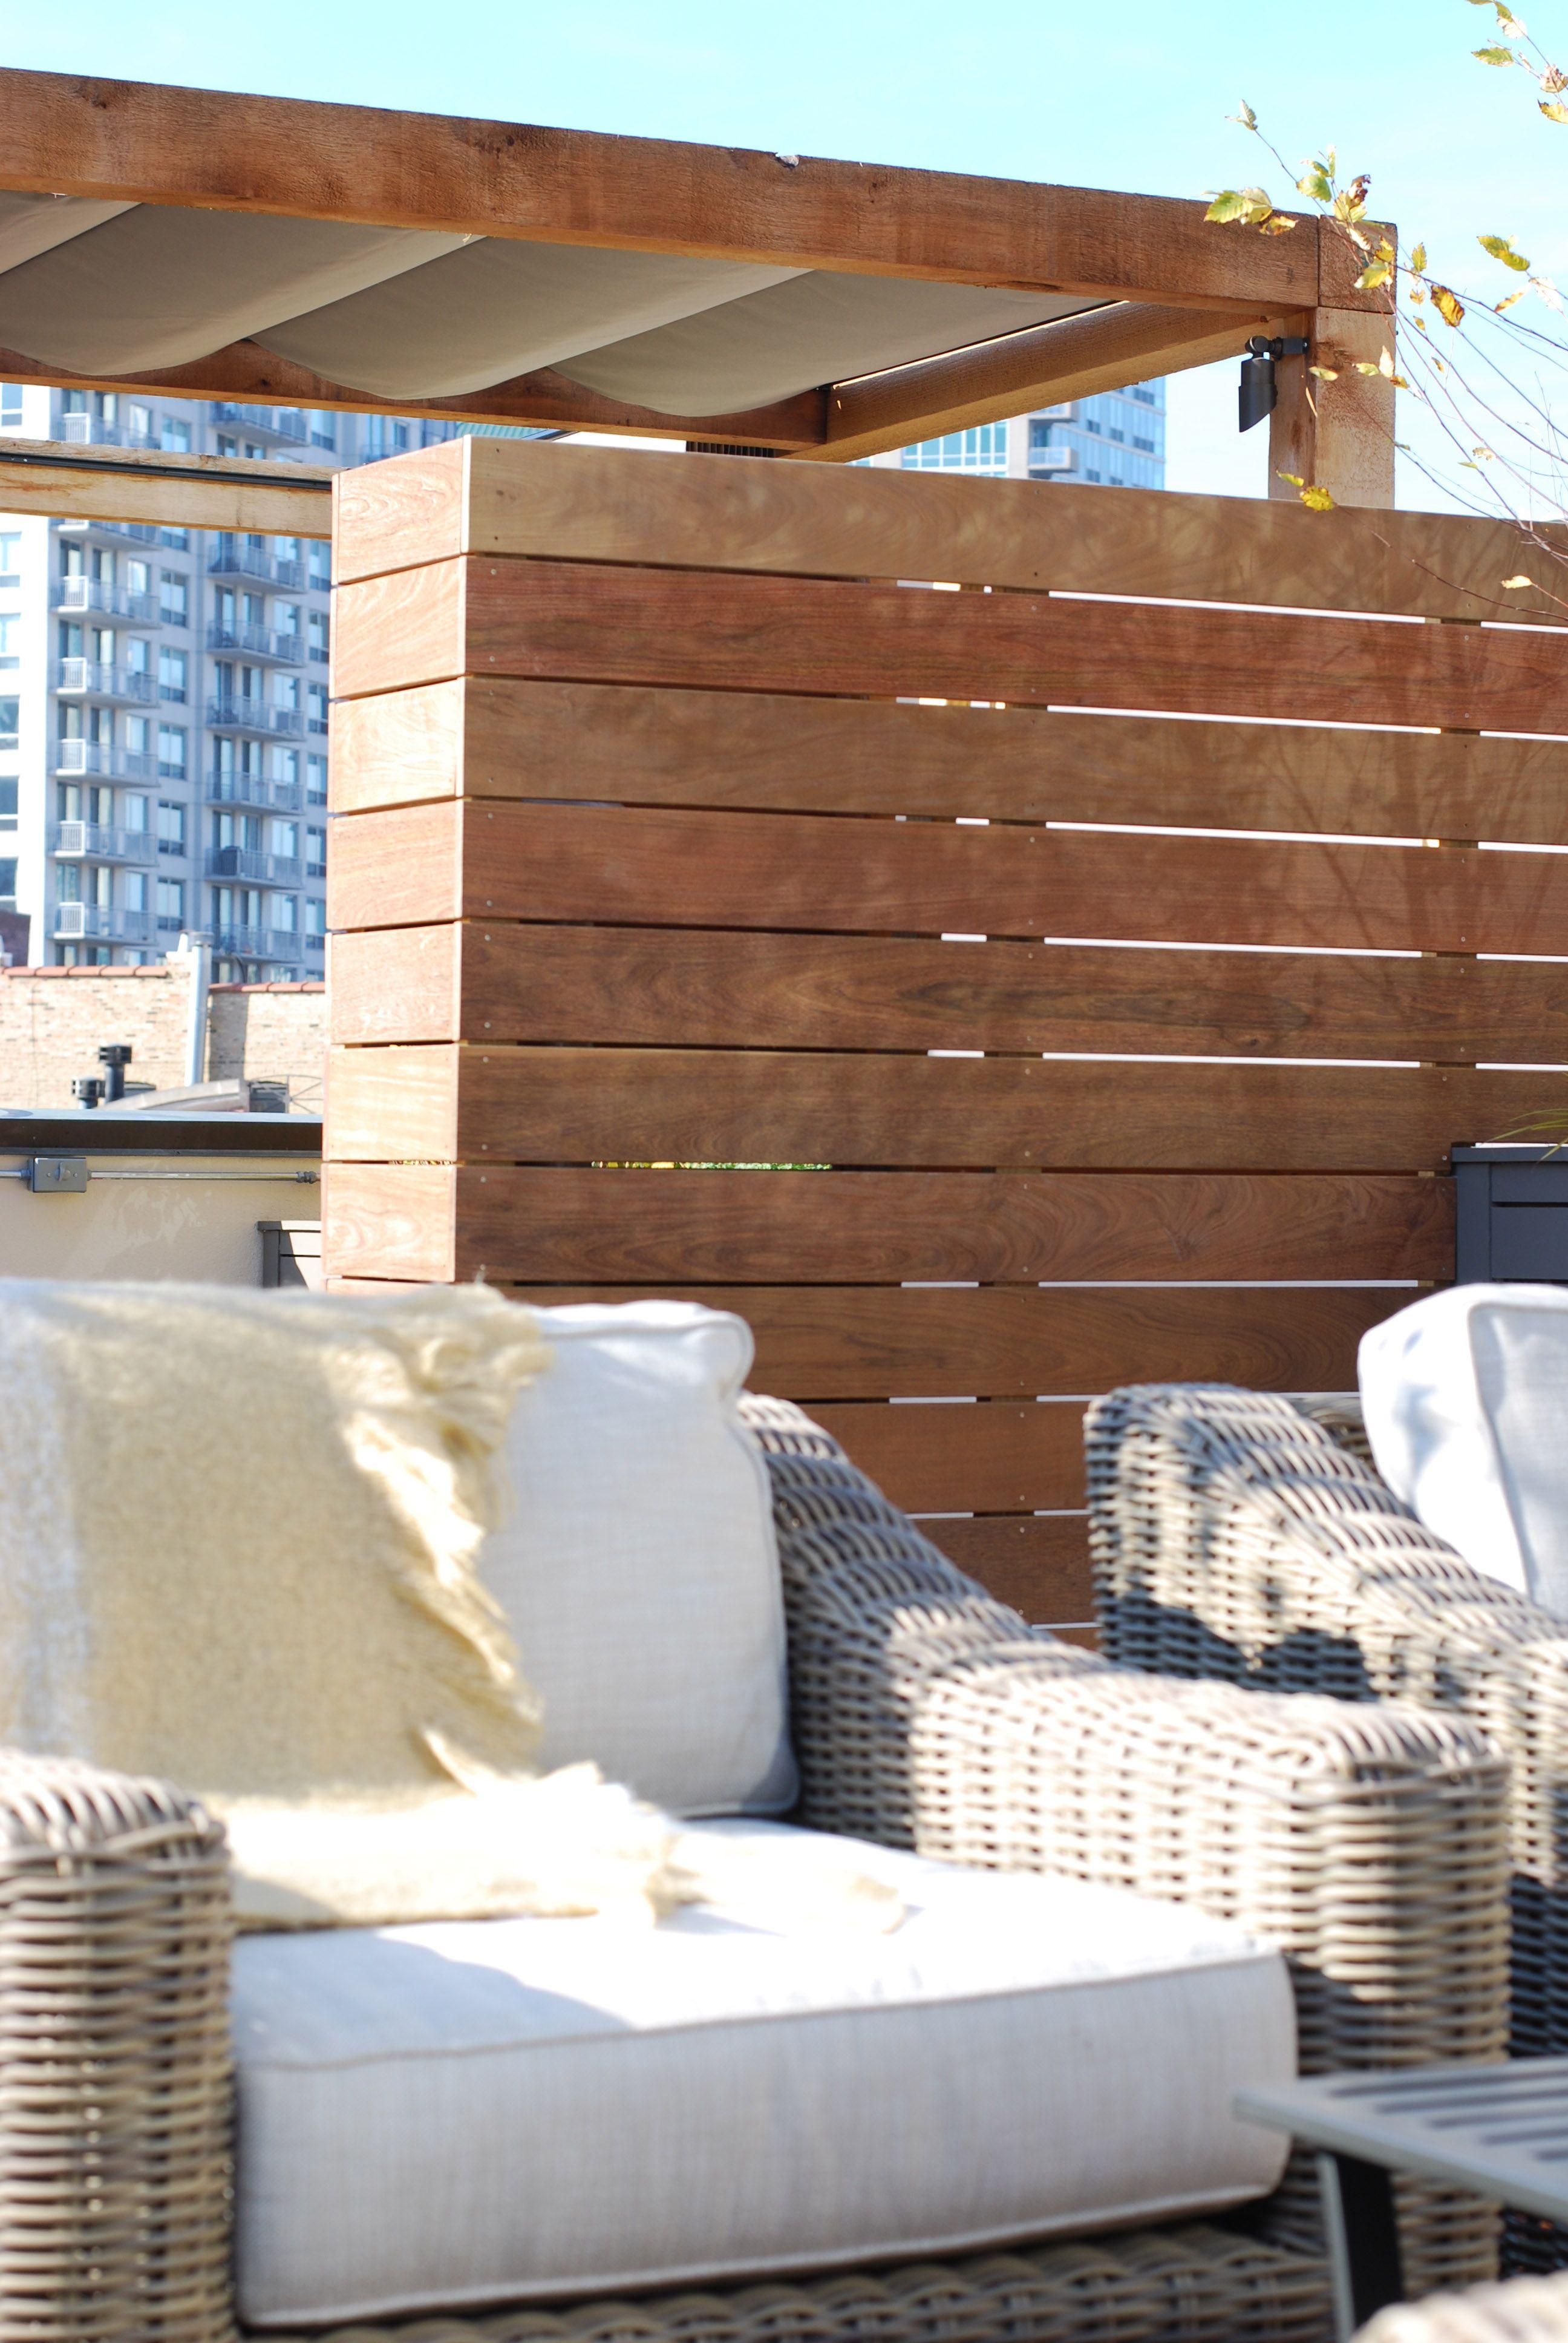 Upper Deck Roof Urban Garden Landscape Design